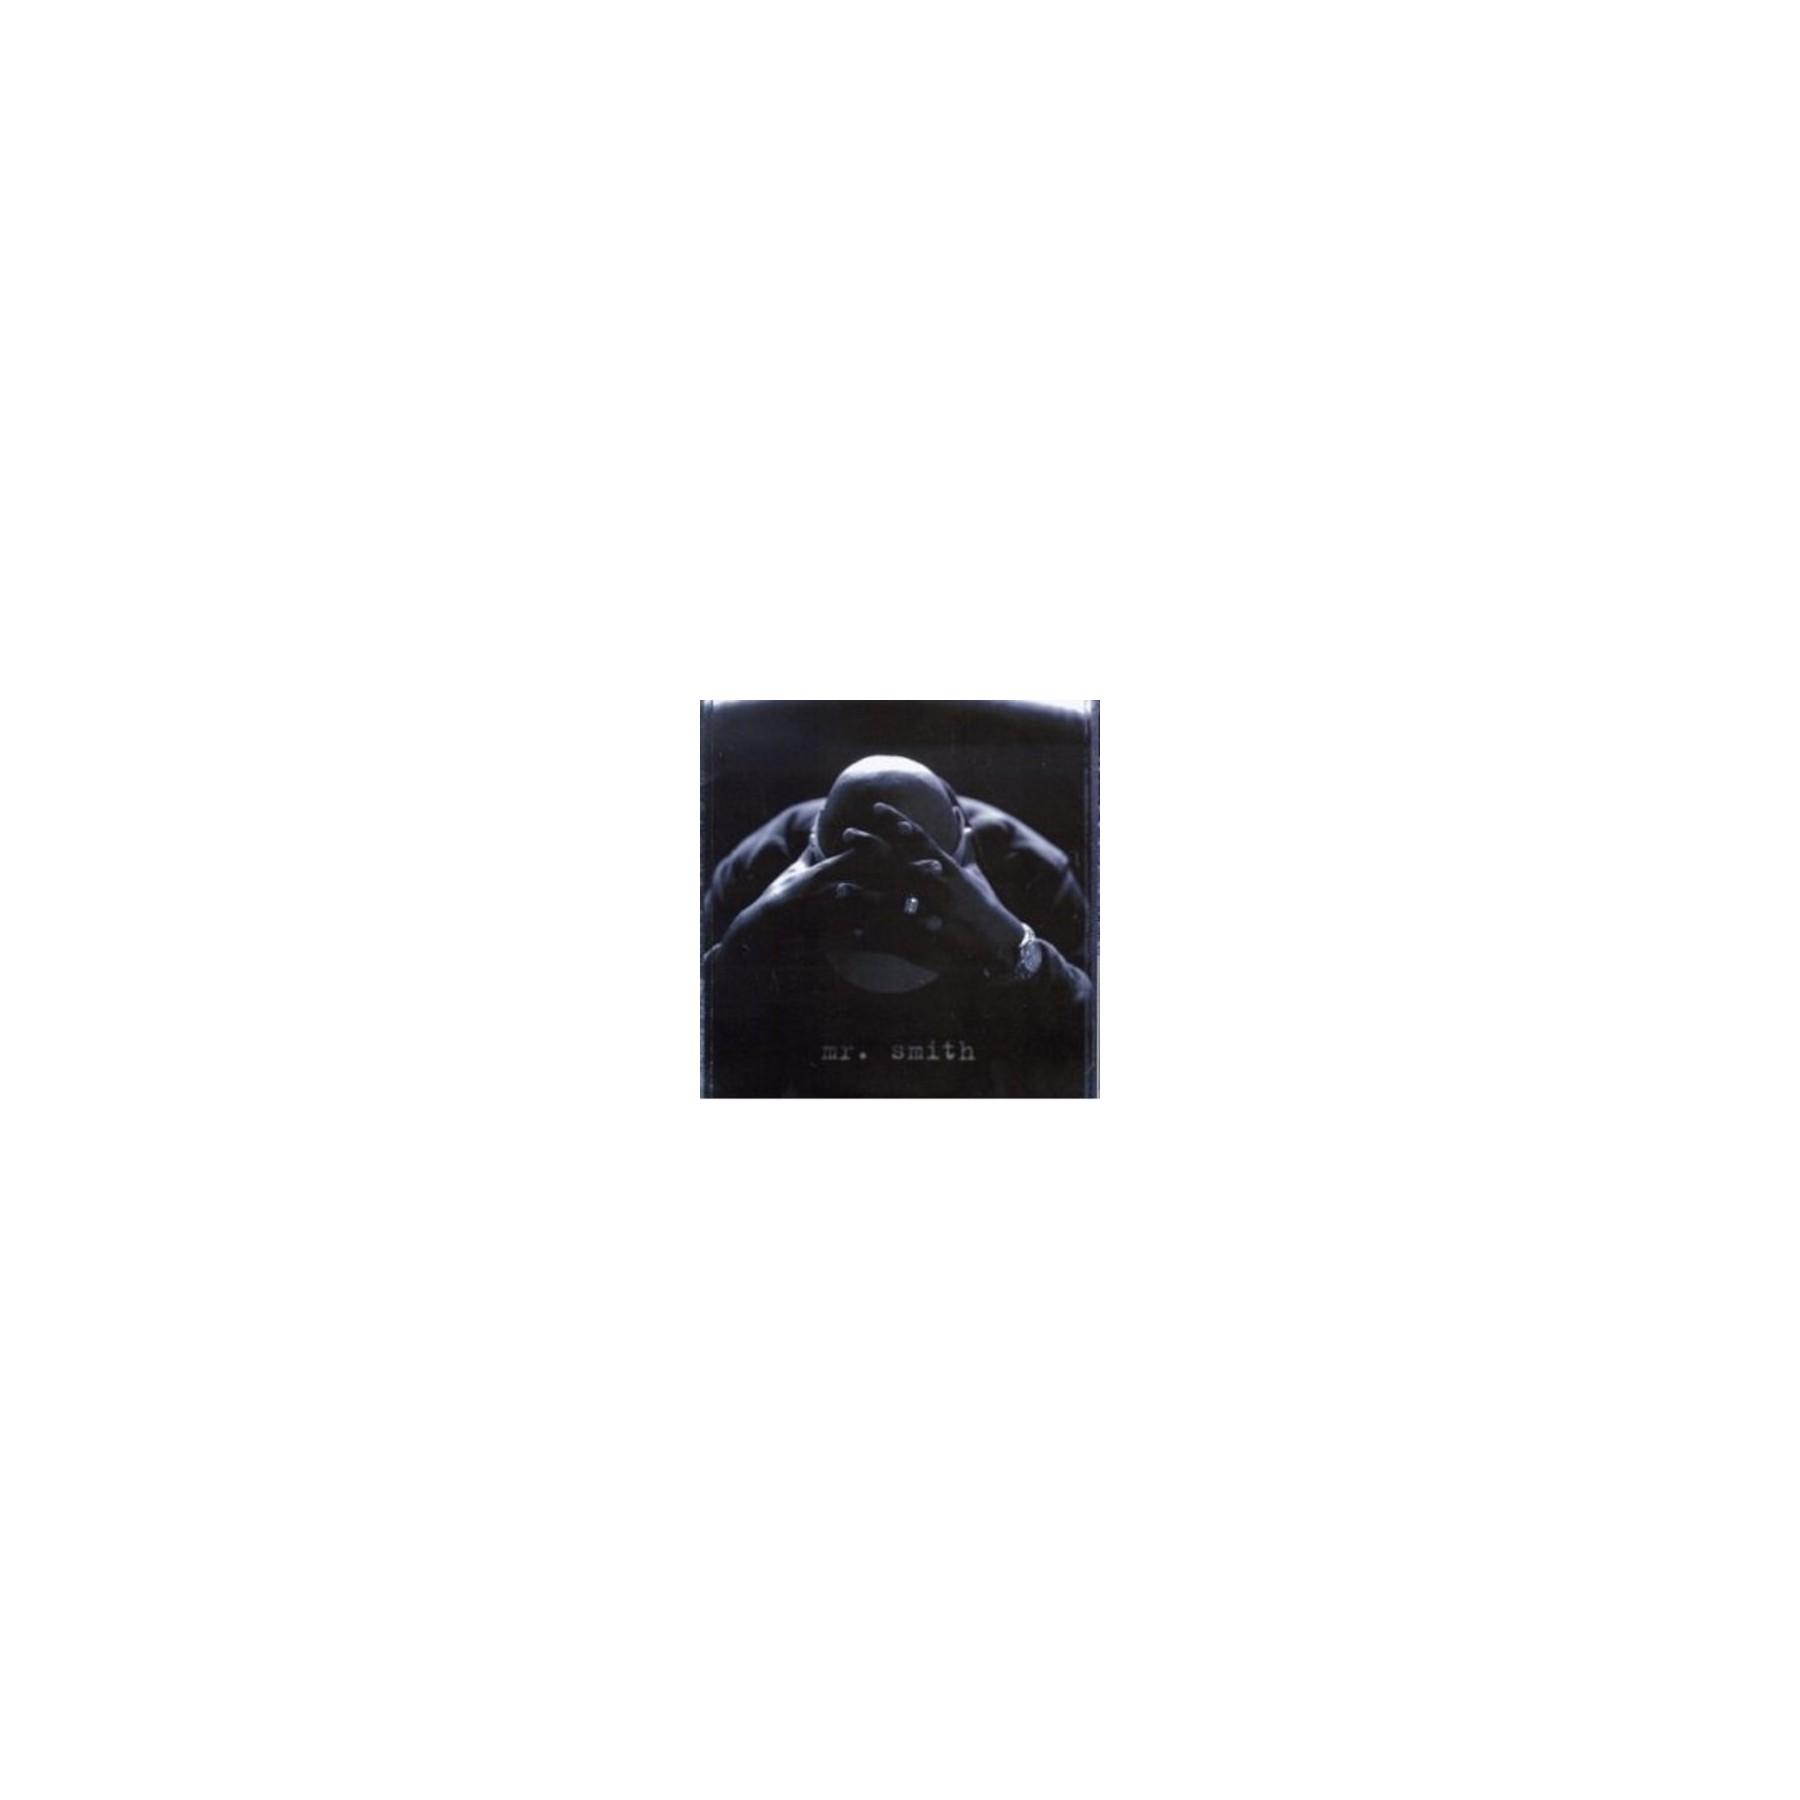 CD LL COOL J - MR SMITH stg